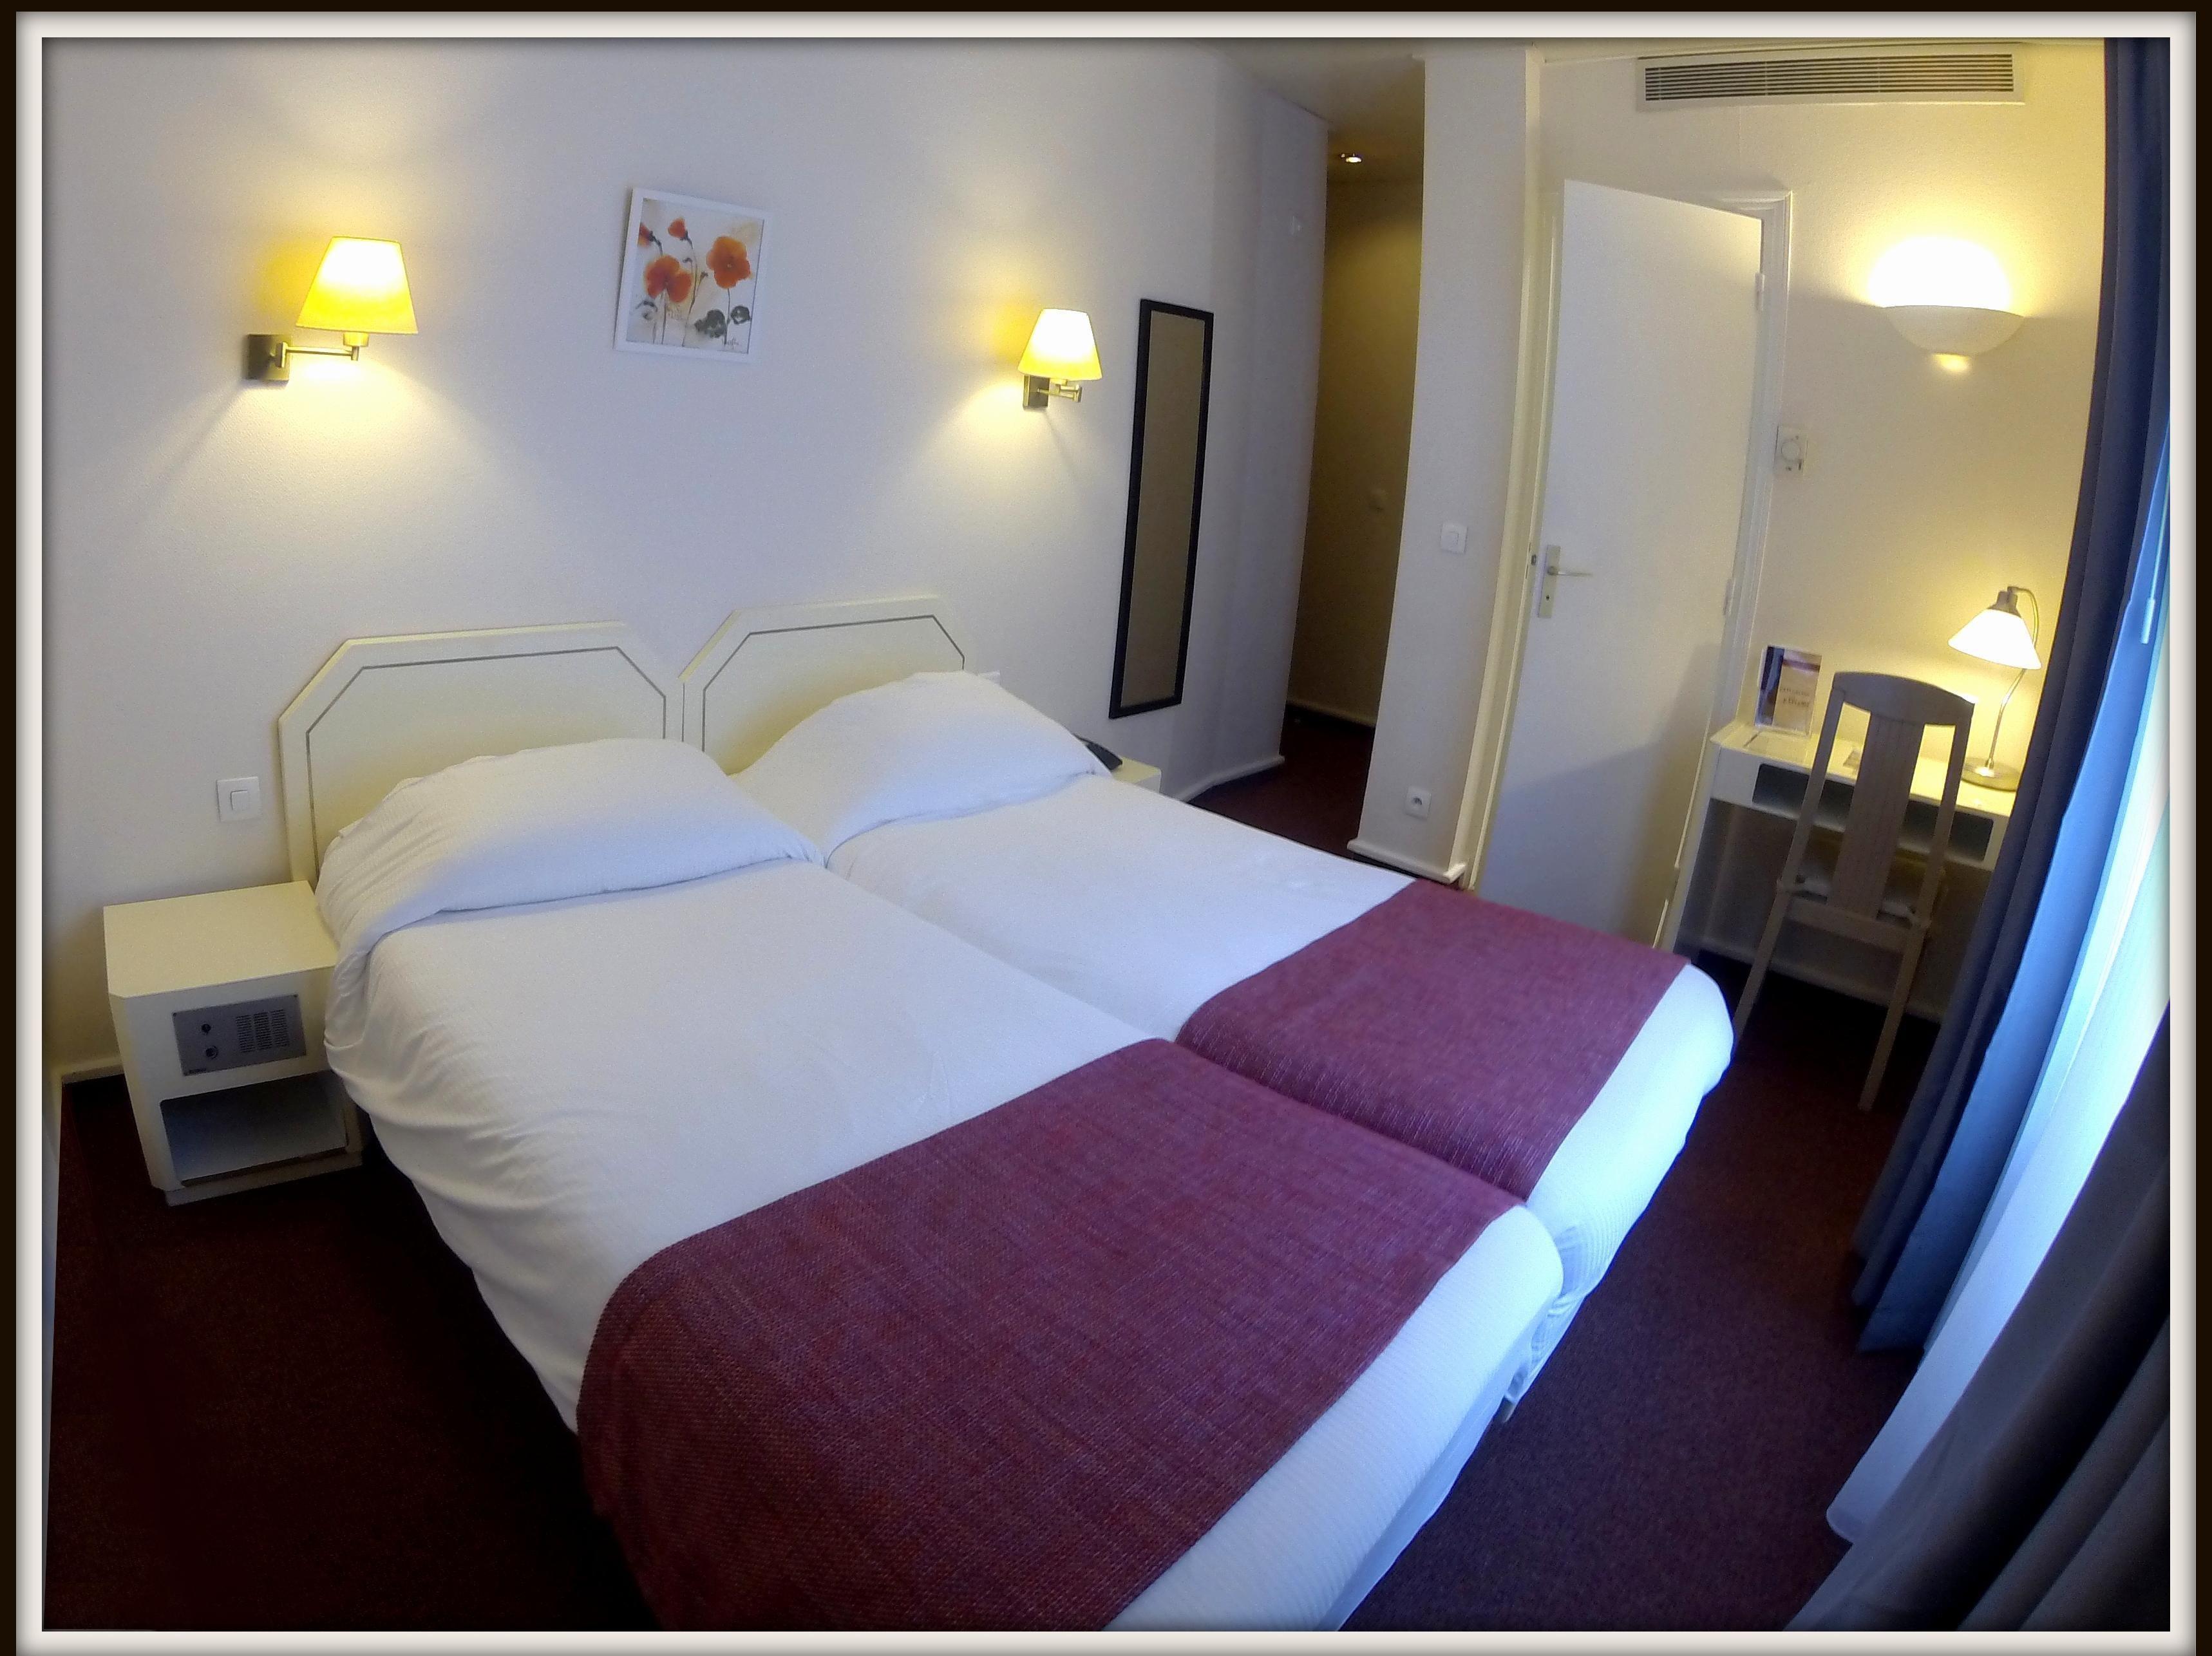 Hotel de Crimee Paris, France